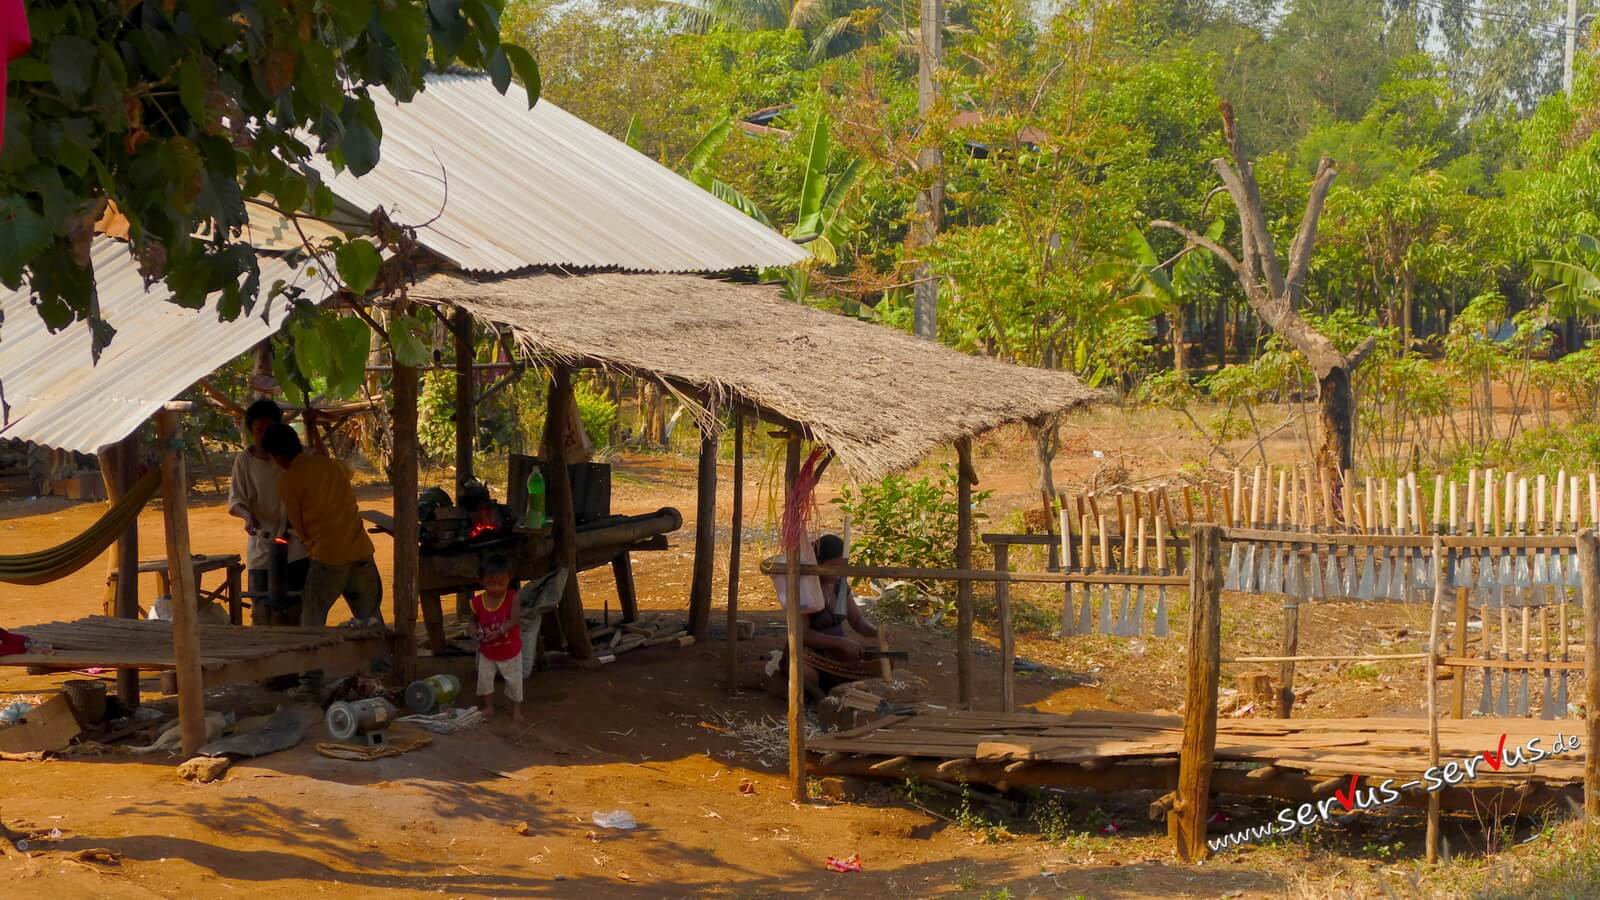 Bolavenpalteau, Laos, Schmiden am Straßenrand